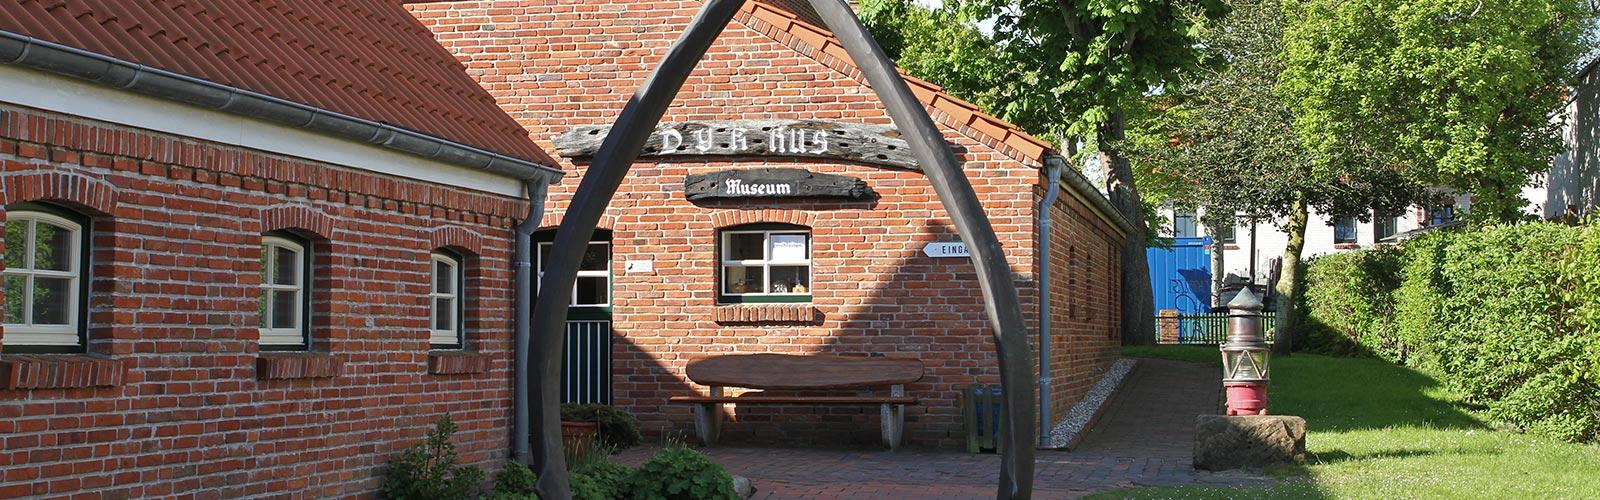 Heimatmuseum Borkum